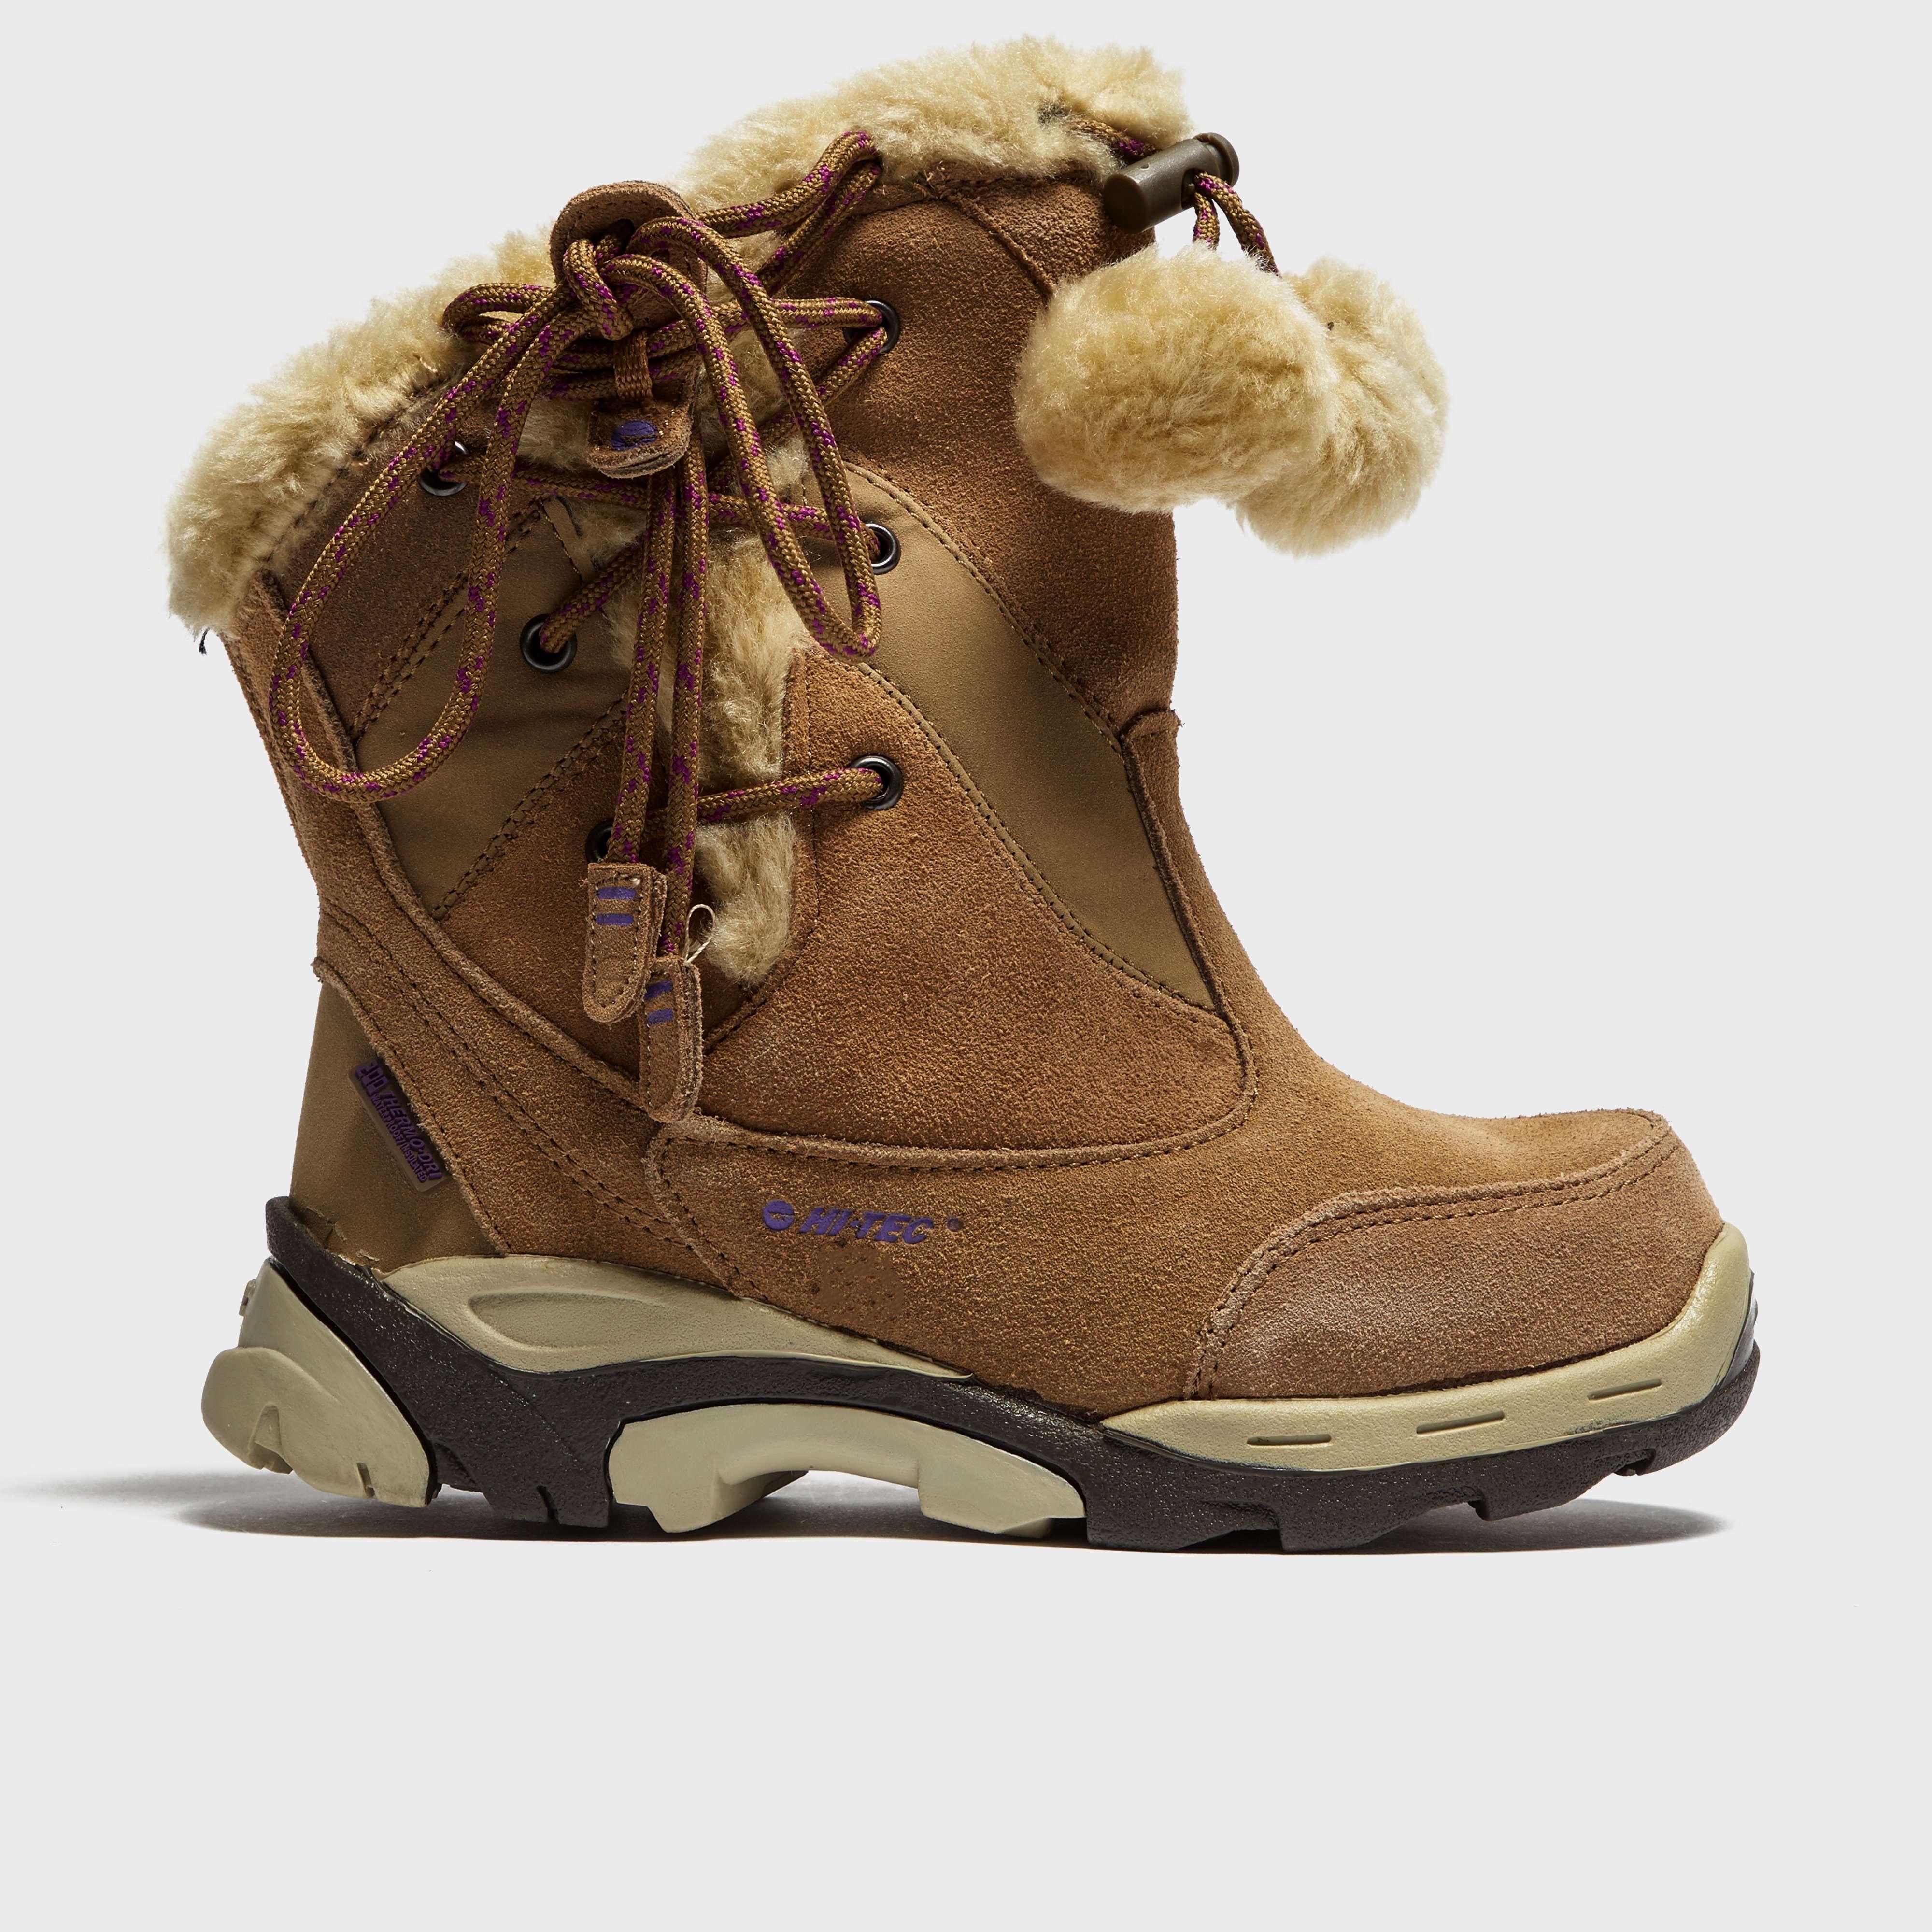 HI TEC Kids' Vali Lace 200 Winter Boot